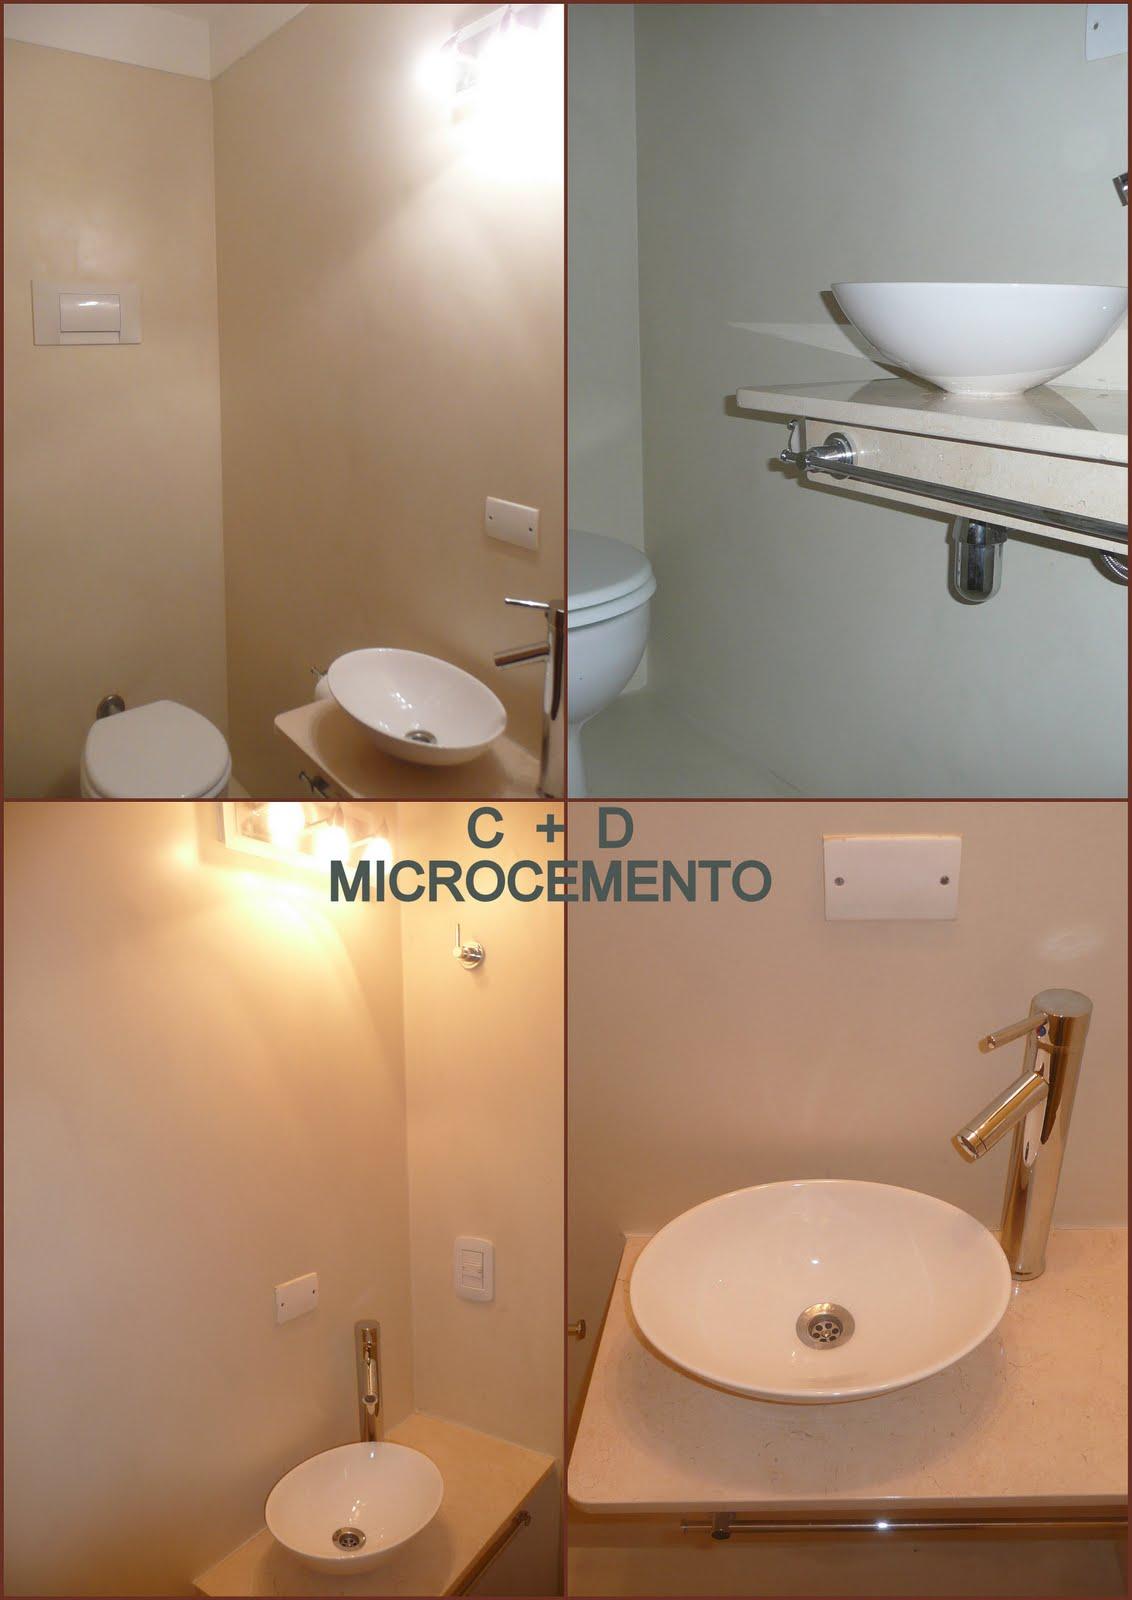 Bachas Para Baño Pequeno:CONSTRUCCION + DISEÑO: RECICLAJE DE TOILETTE – MICROCEMENTO